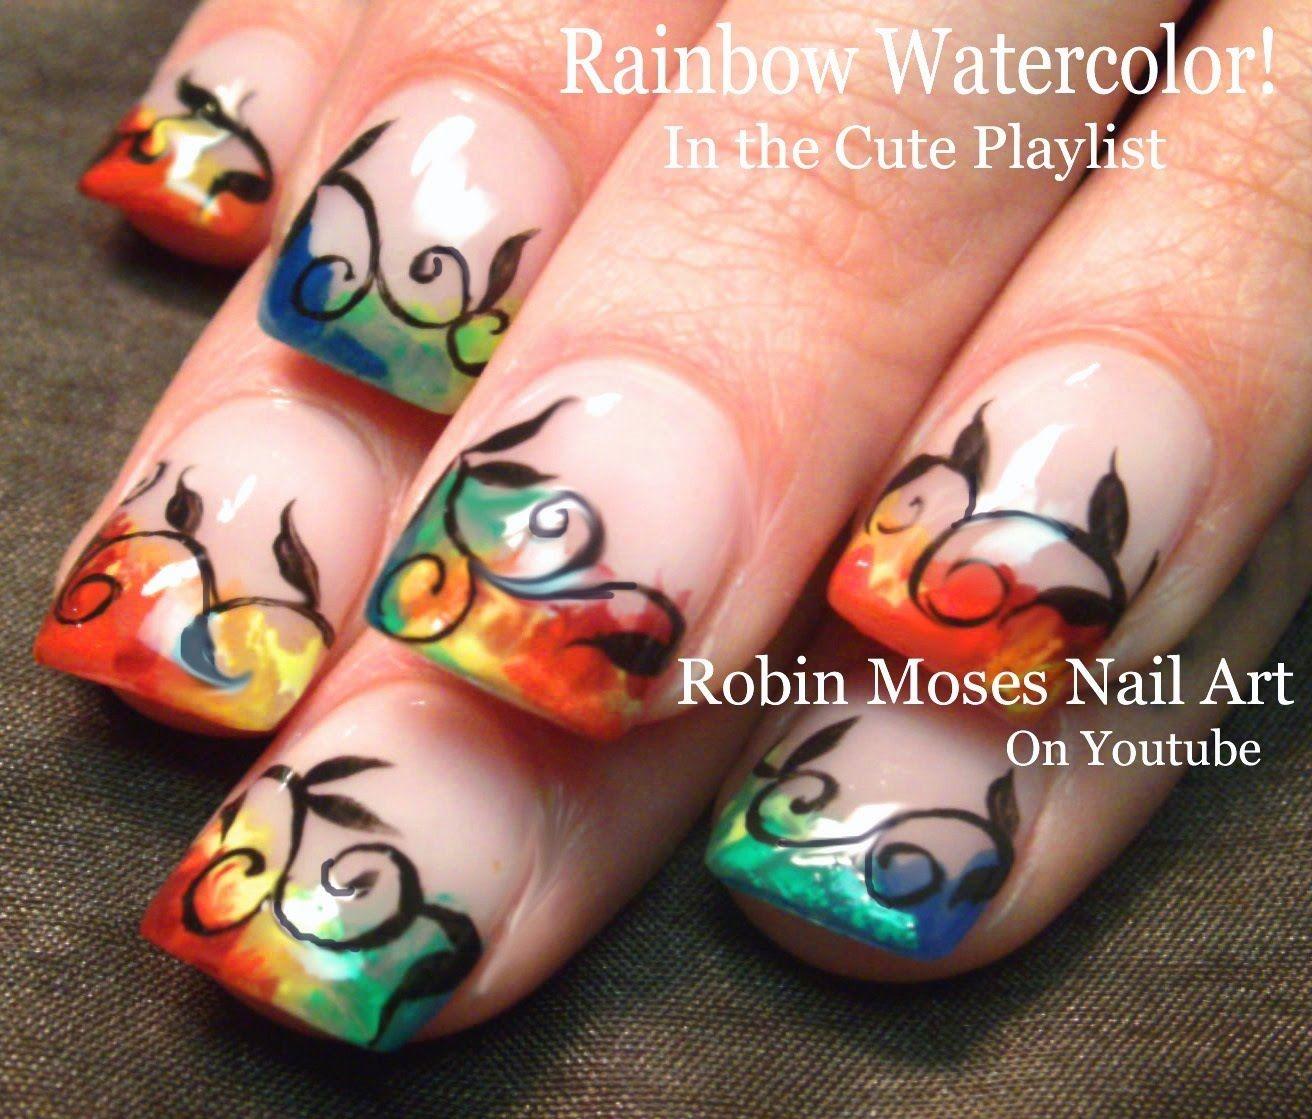 Toe Nail Art Tutorials: Watercolor Rainbow Nails